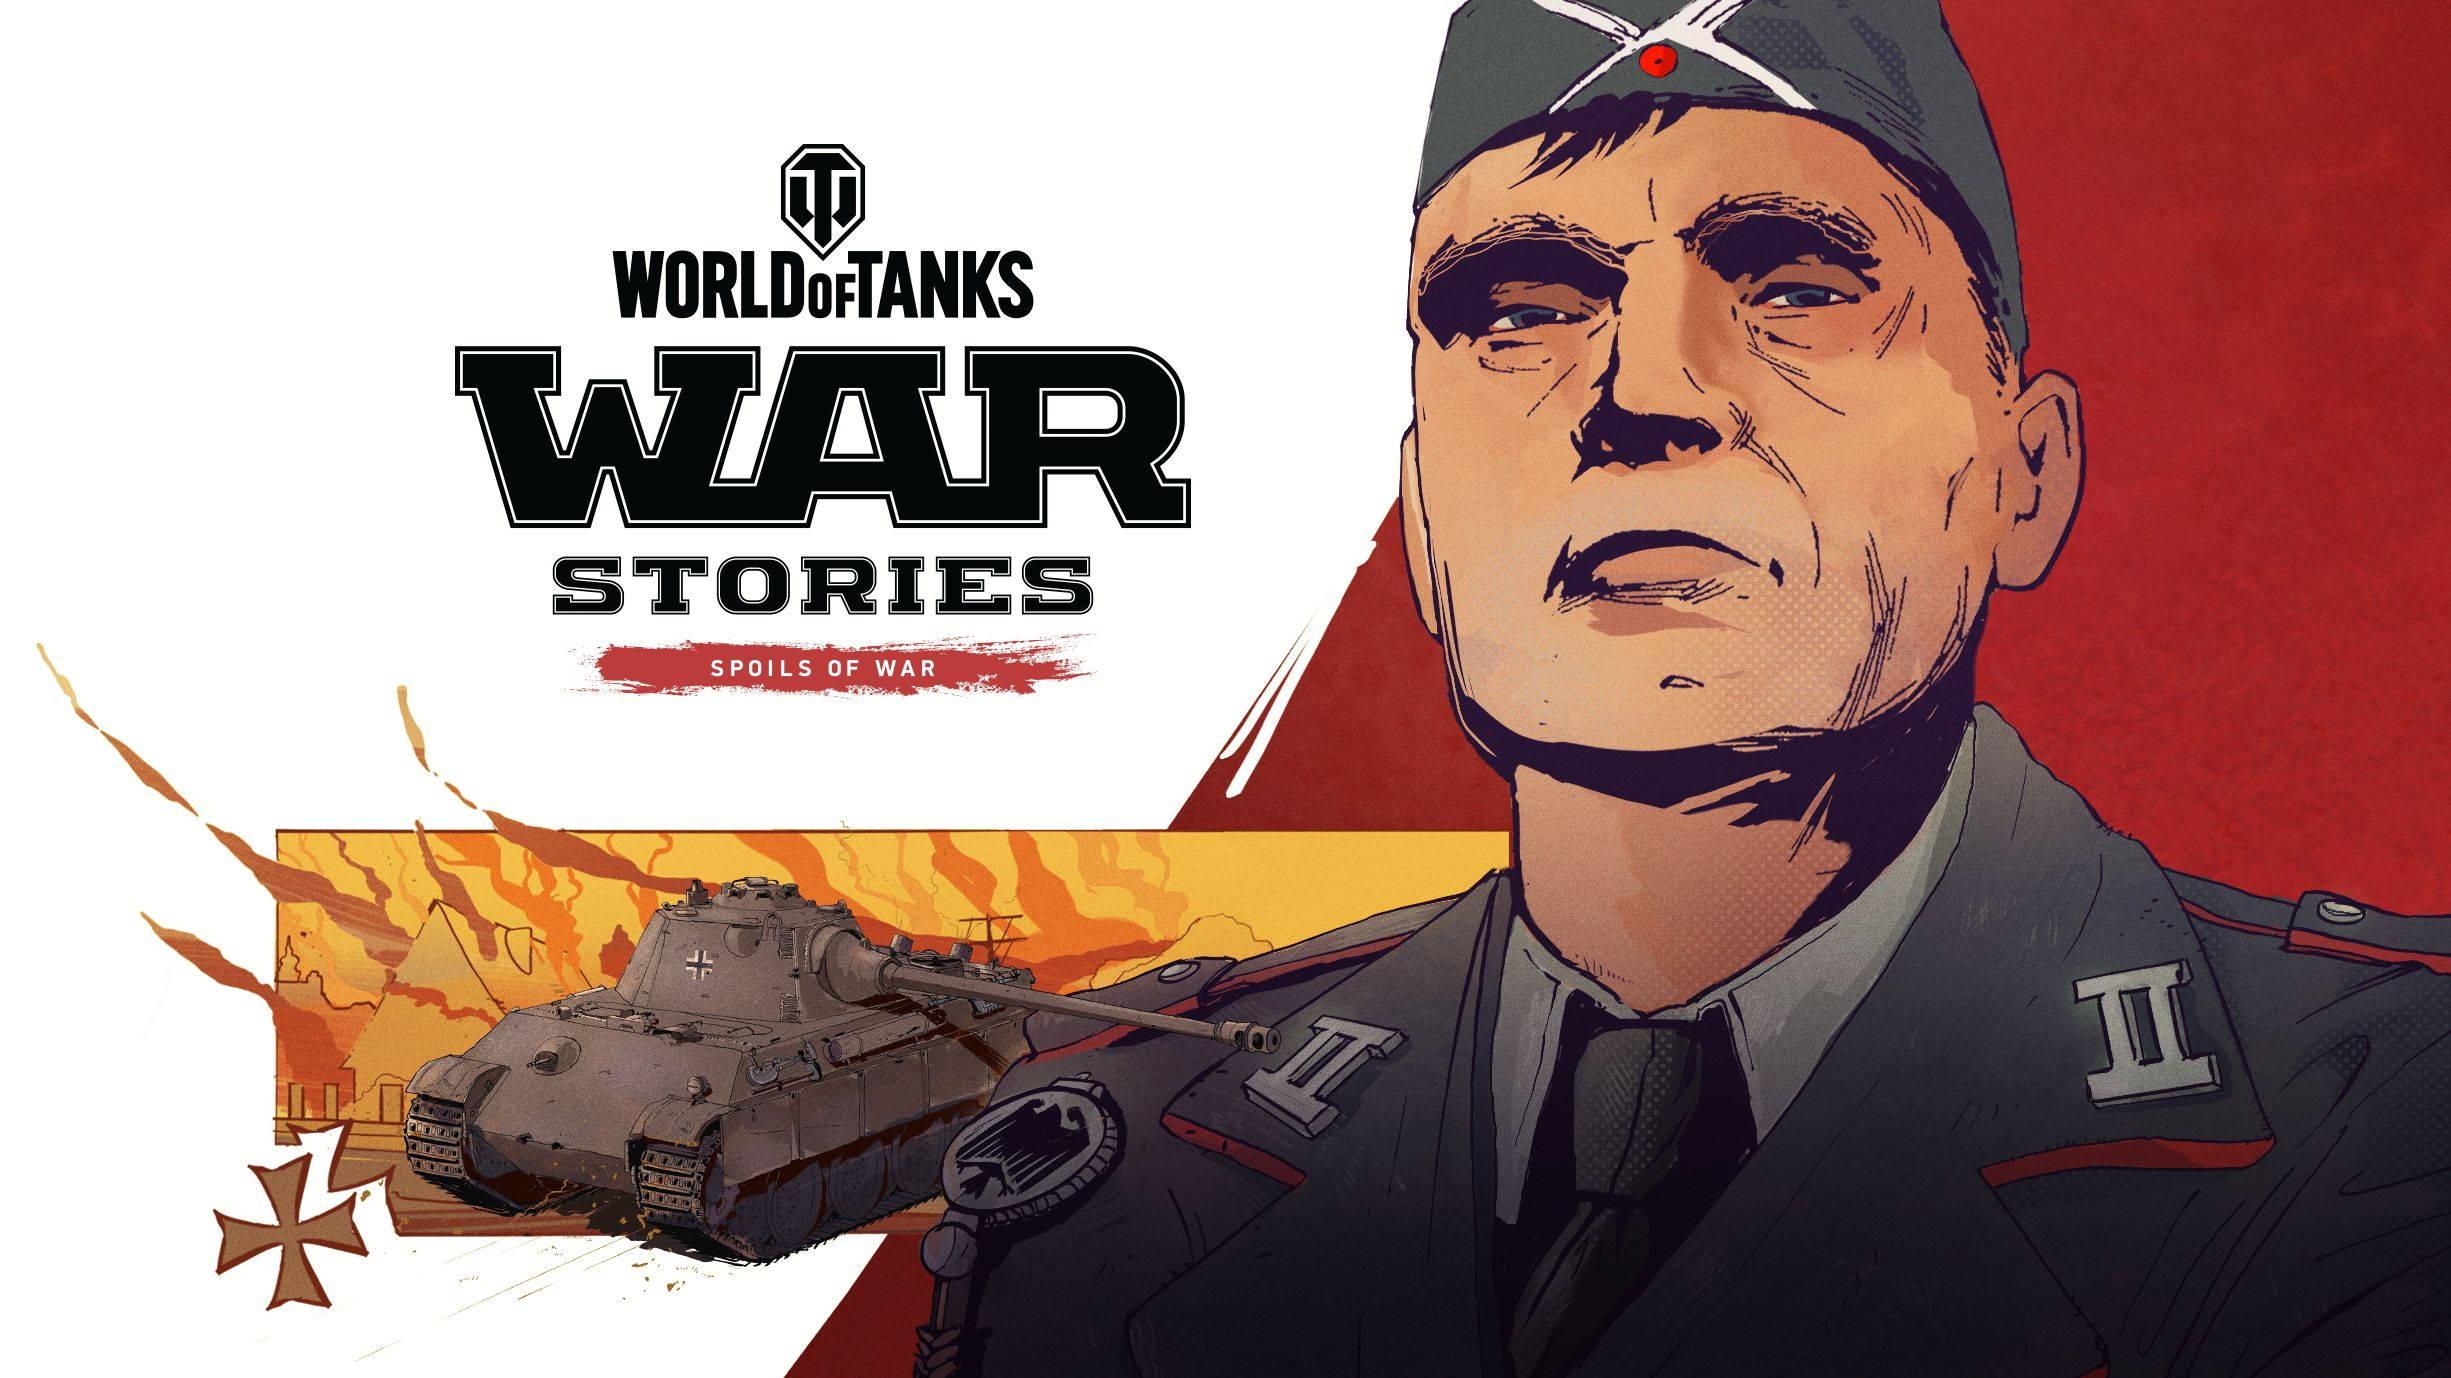 worldoftanks_warstoriesspoilsofwarimages_0016